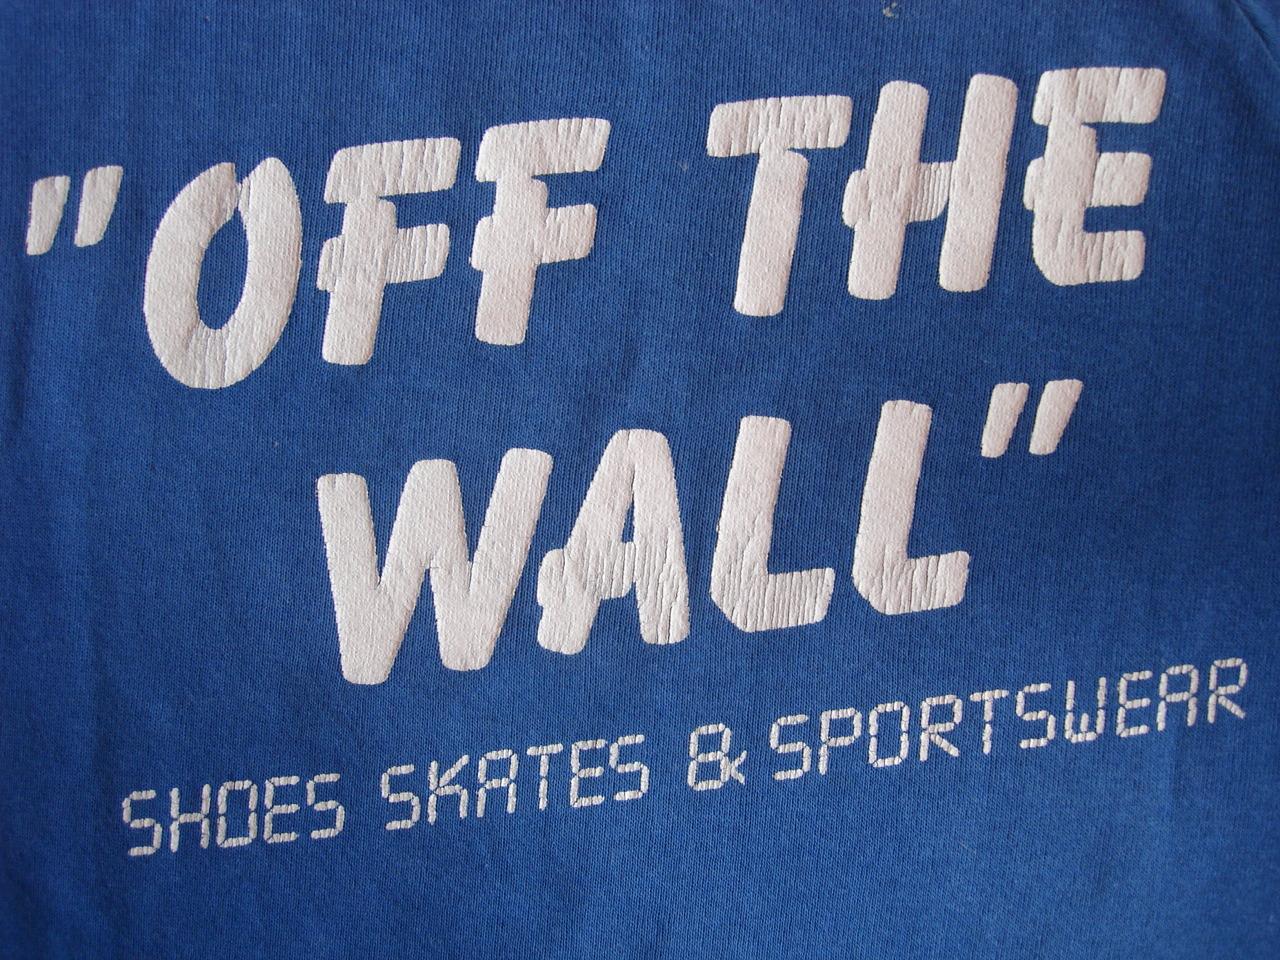 http://4.bp.blogspot.com/-0oJl6g6oC_4/UGsDTncrHfI/AAAAAAAAQUk/E_sMiFuATgo/s1600/vintage+vans+clothing+off+the+wall+bmx+sweatshirt+used+1980%27s+dutch+championship+(7).JPG